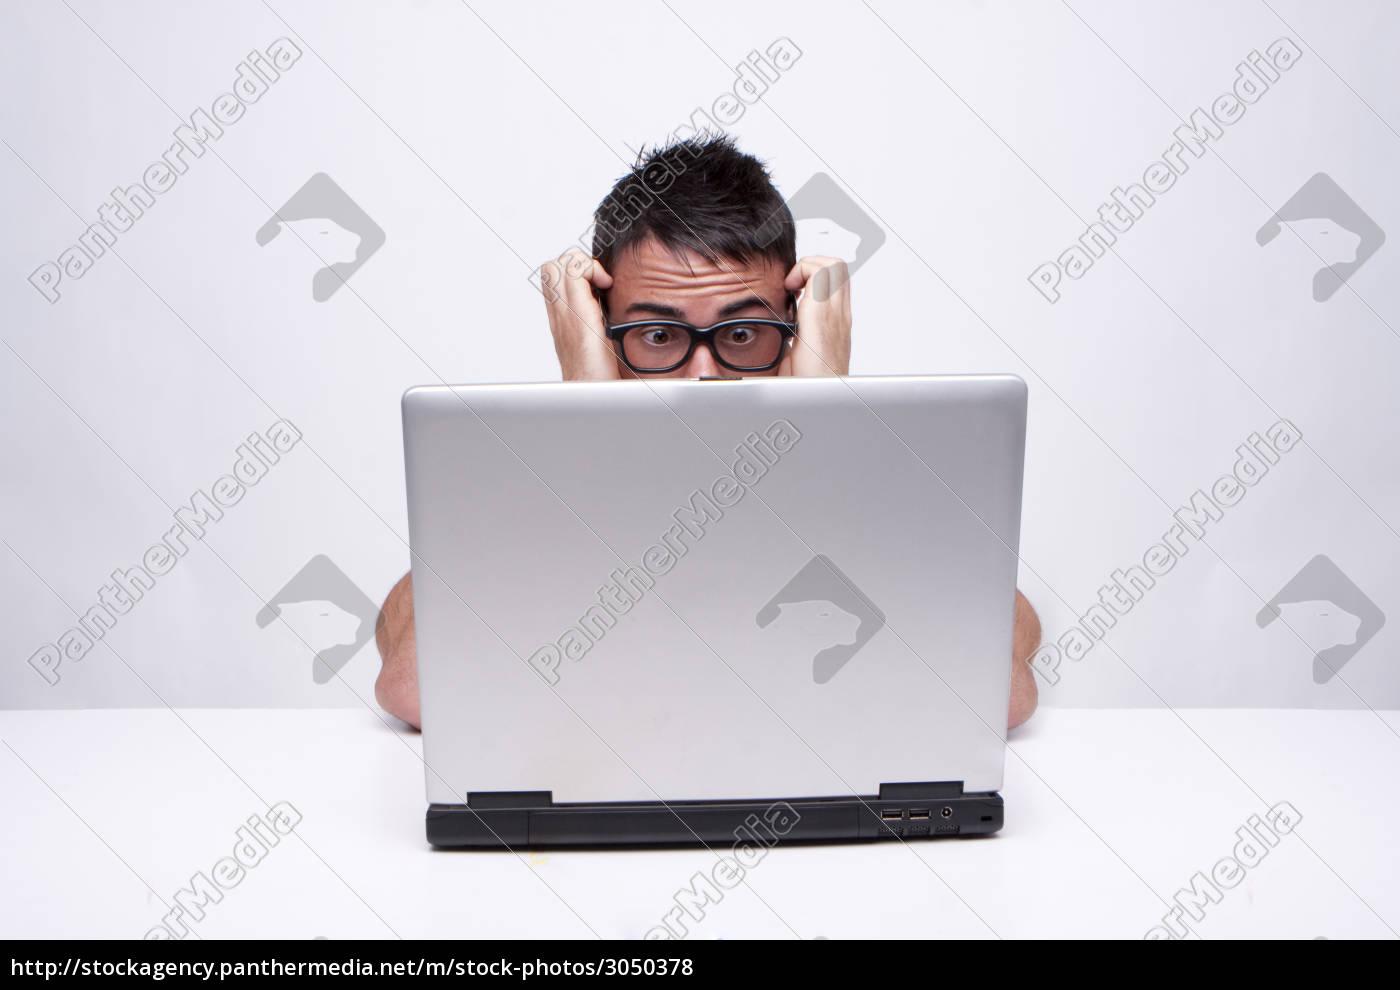 computer, problems - 3050378